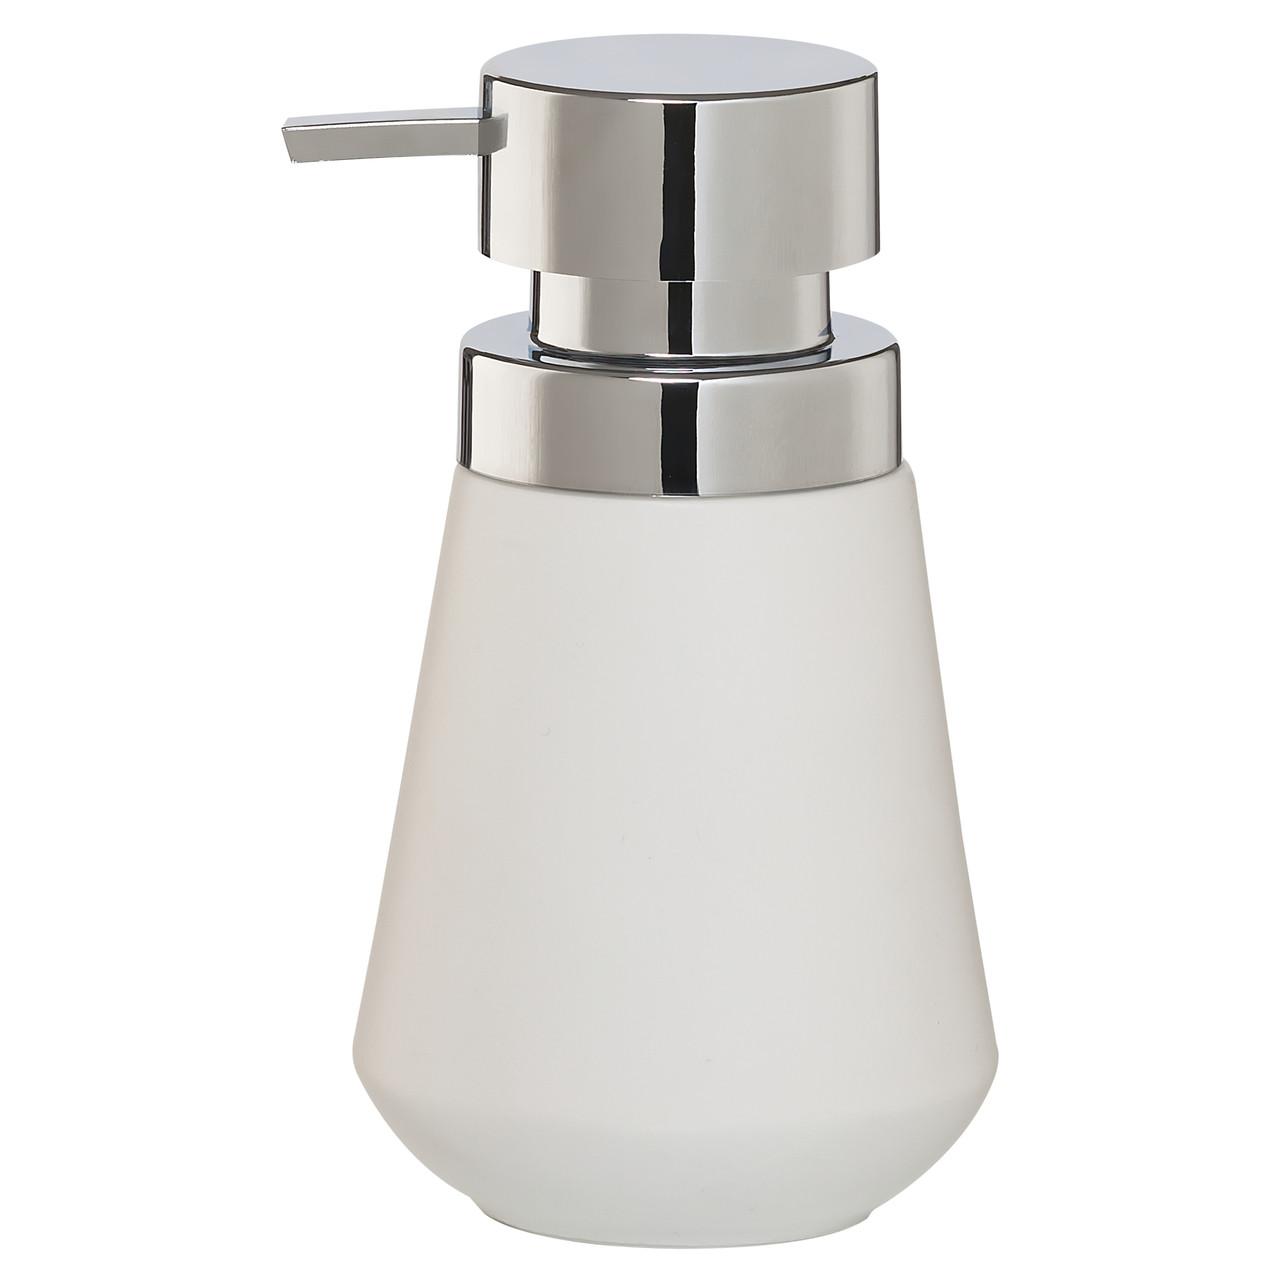 Countertop Soap Dispenser Sealskin Conical Chrome White Porcelain